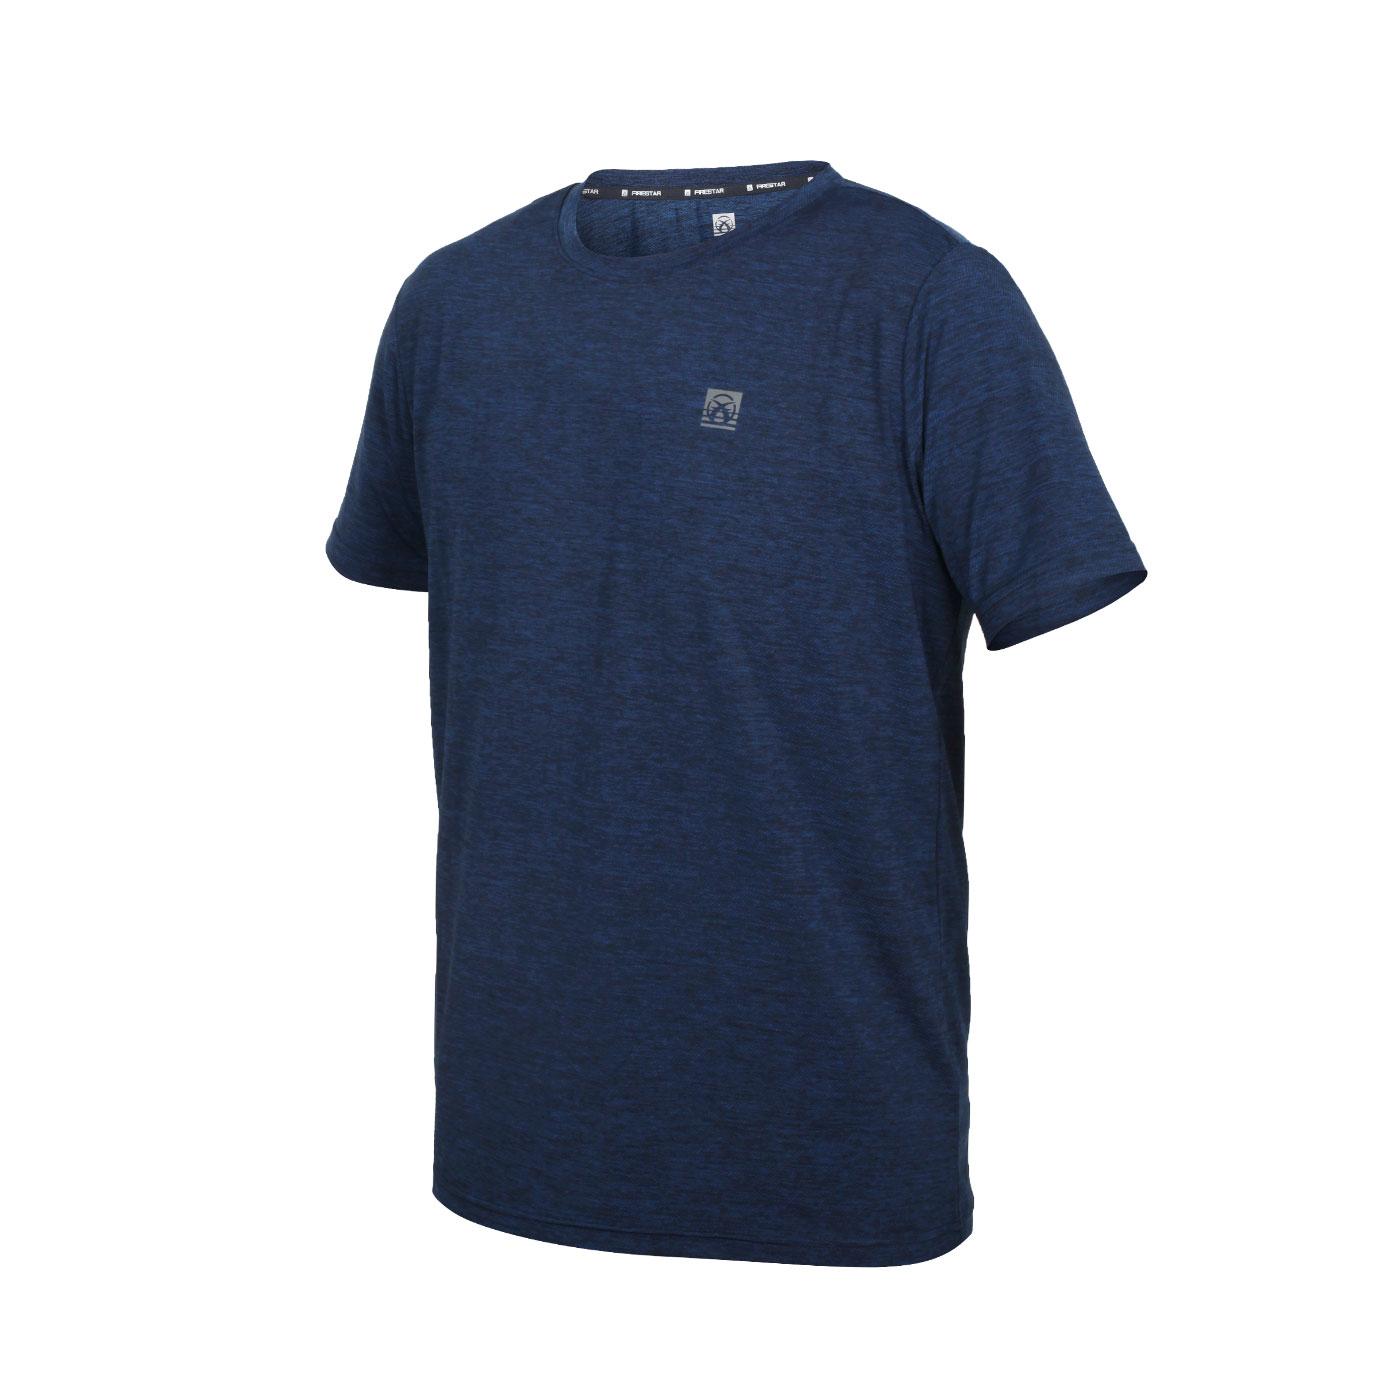 FIRESTAR 男款彈性機能圓領T恤 D1731-93